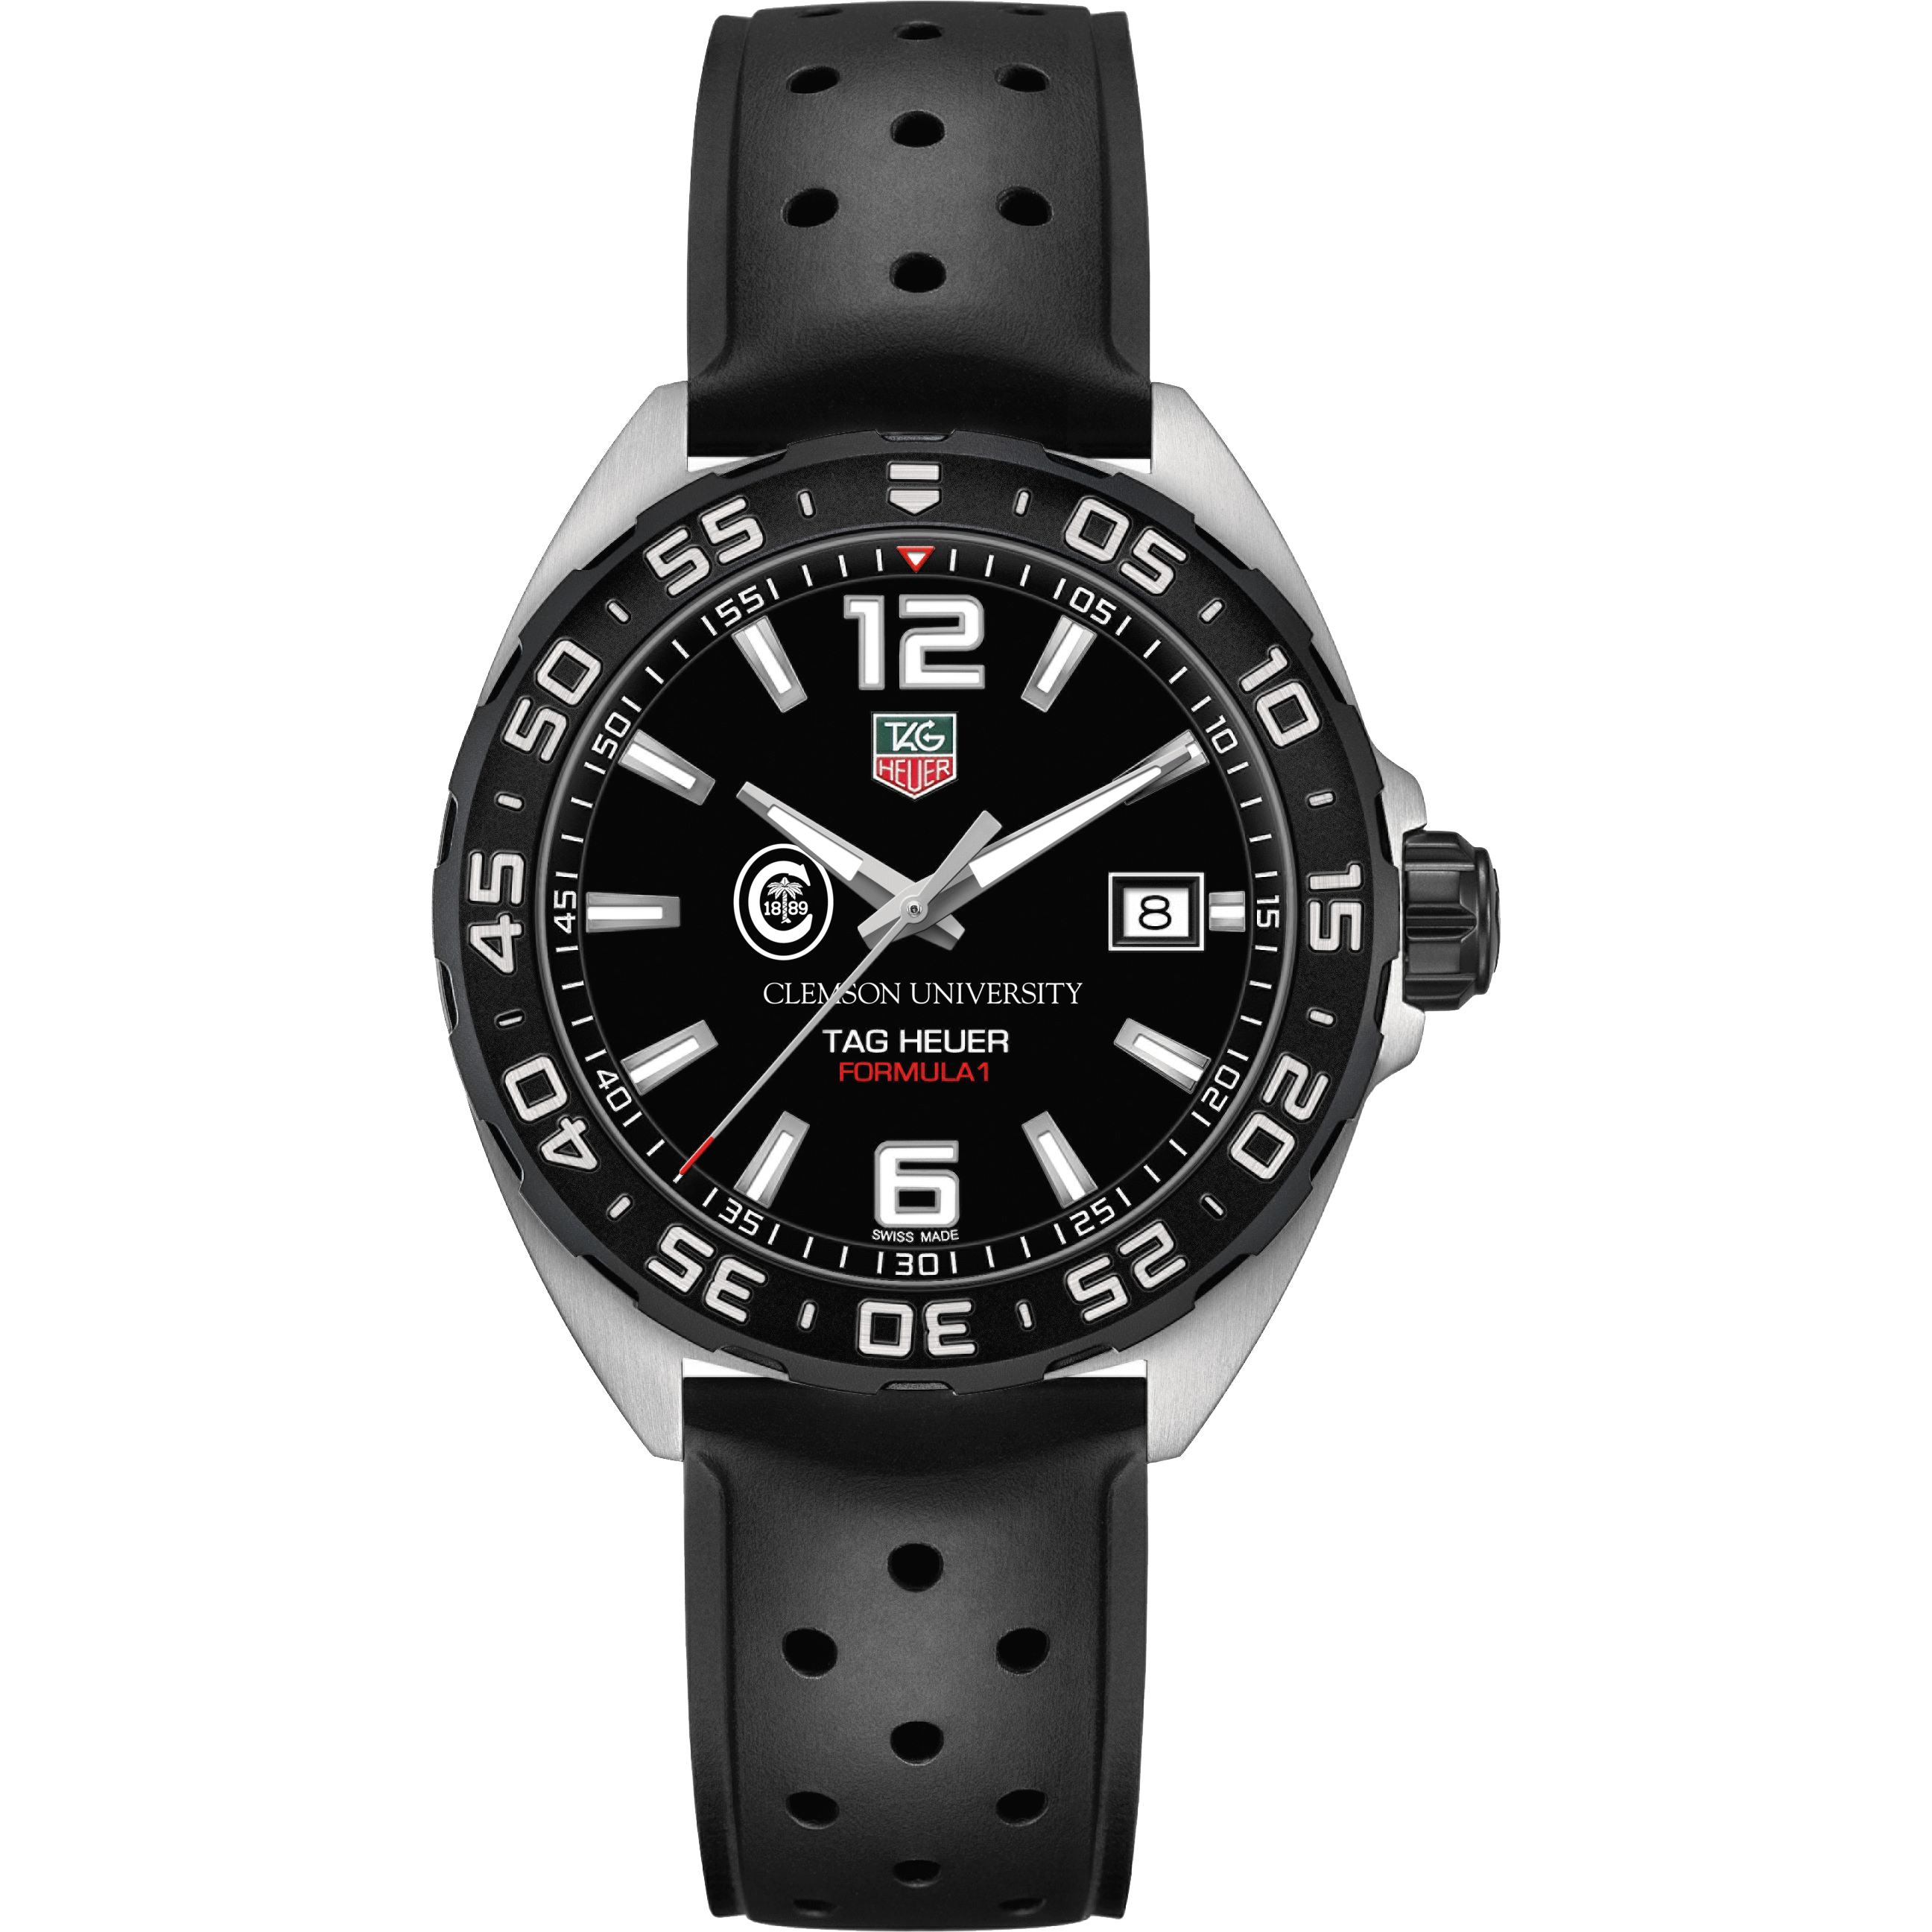 Clemson Men's TAG Heuer Formula 1 with Black Dial - Image 2